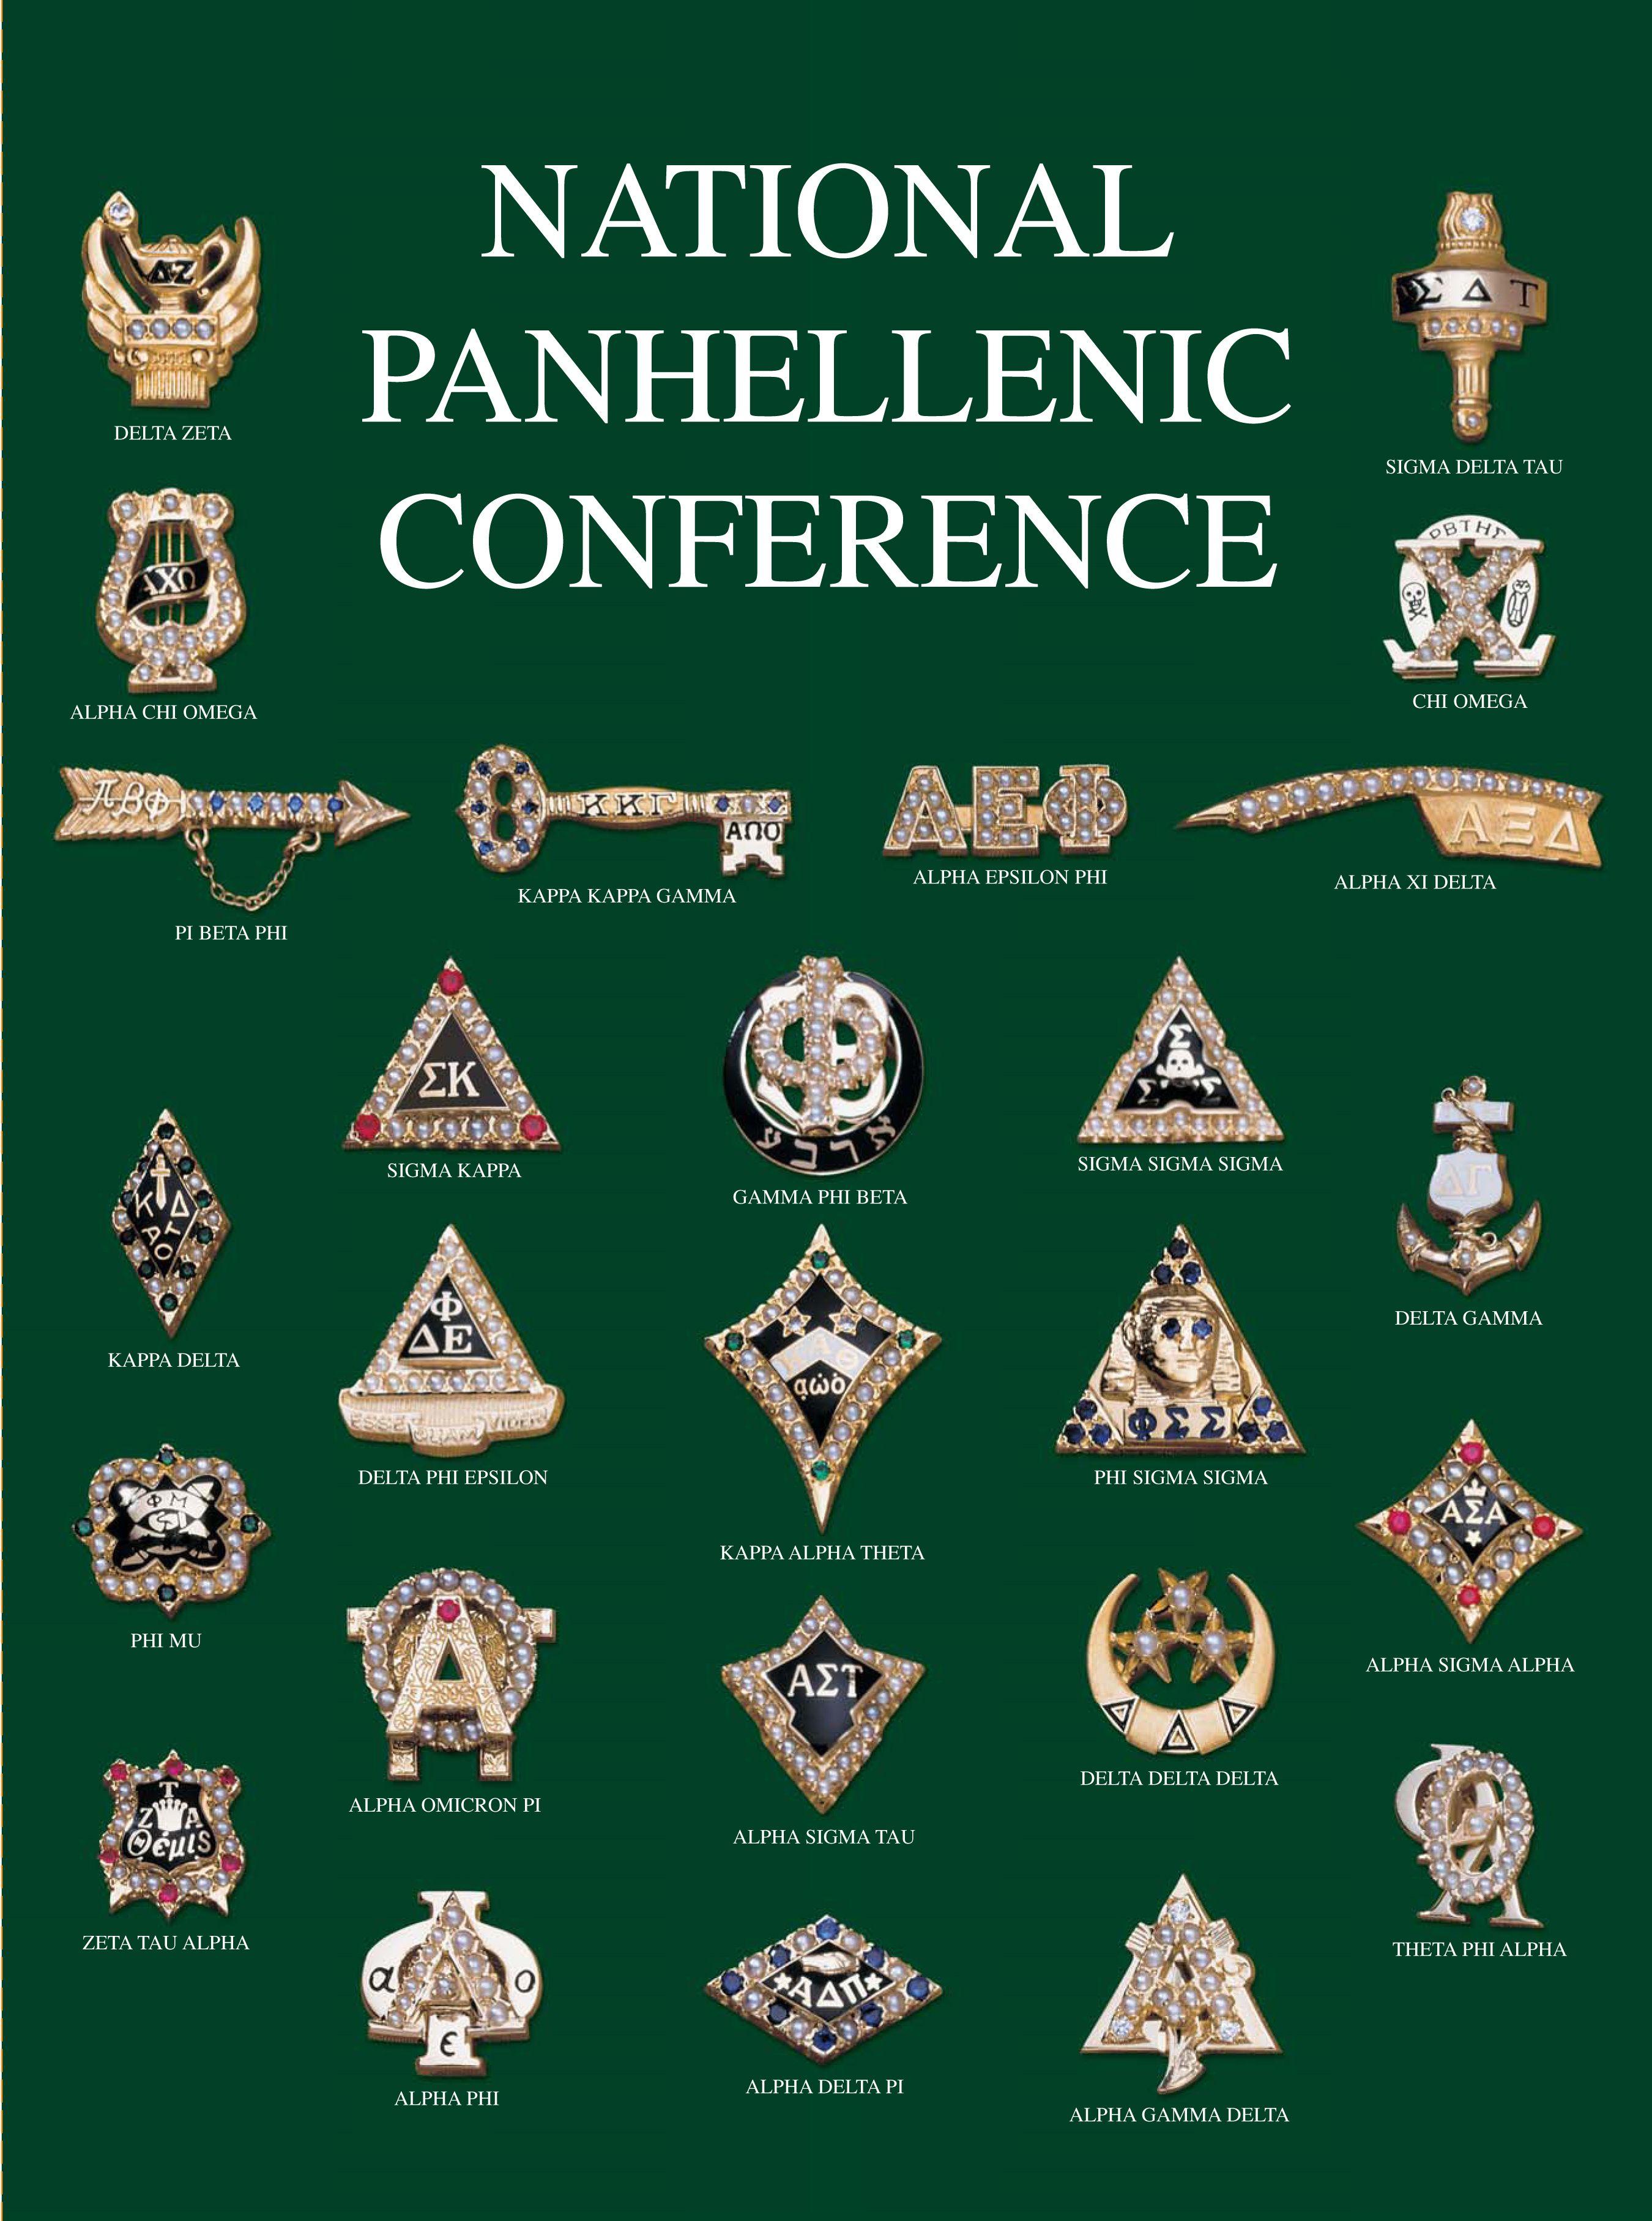 The Badges Of All 26 Npc Member Organizations Panhellenic